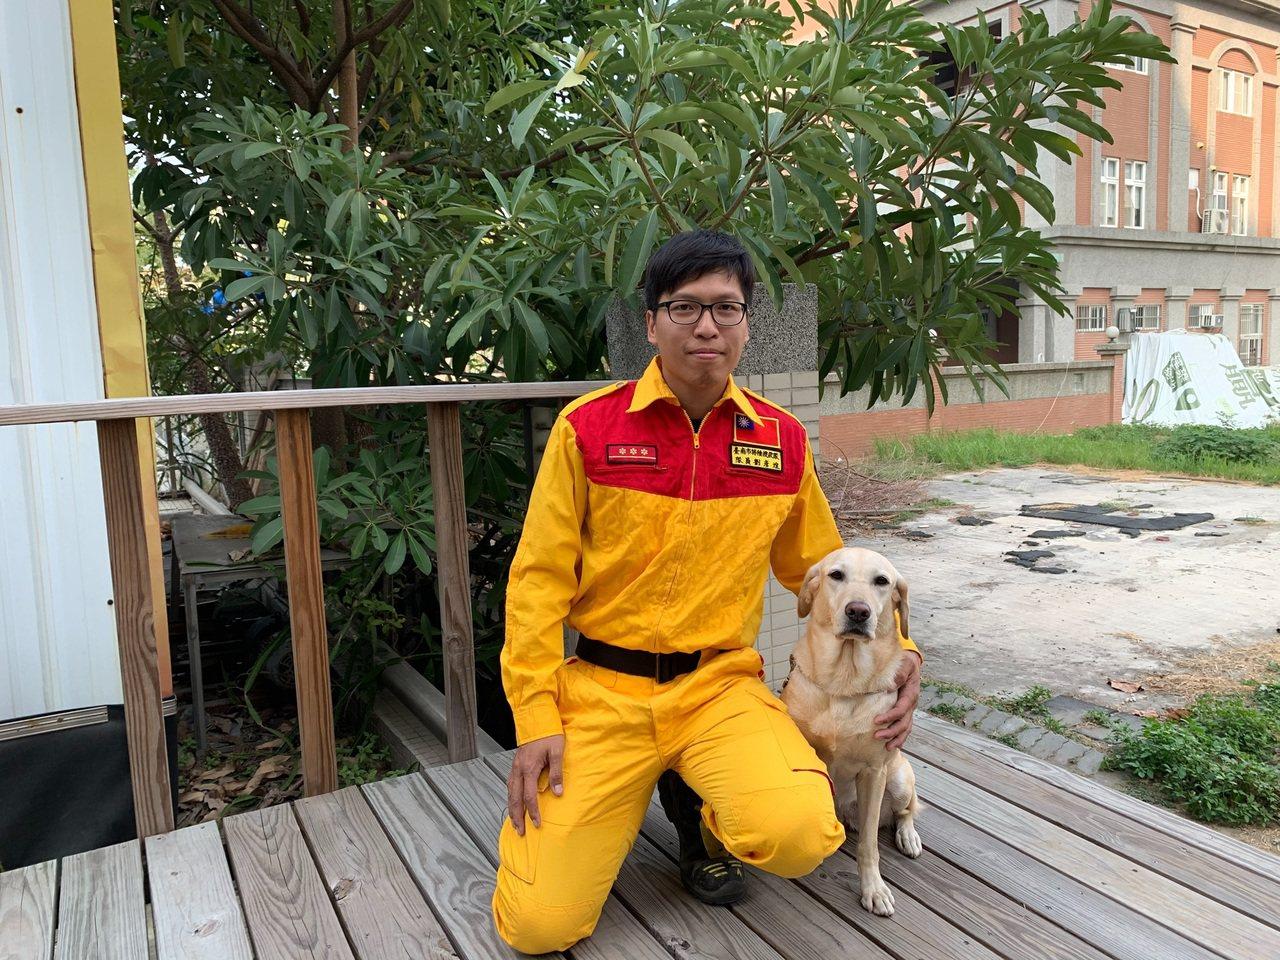 Kathy領犬員劉彥煌表示,Kathy愛玩愛吃,食量大體力好,瓦礫堆中英勇救人。